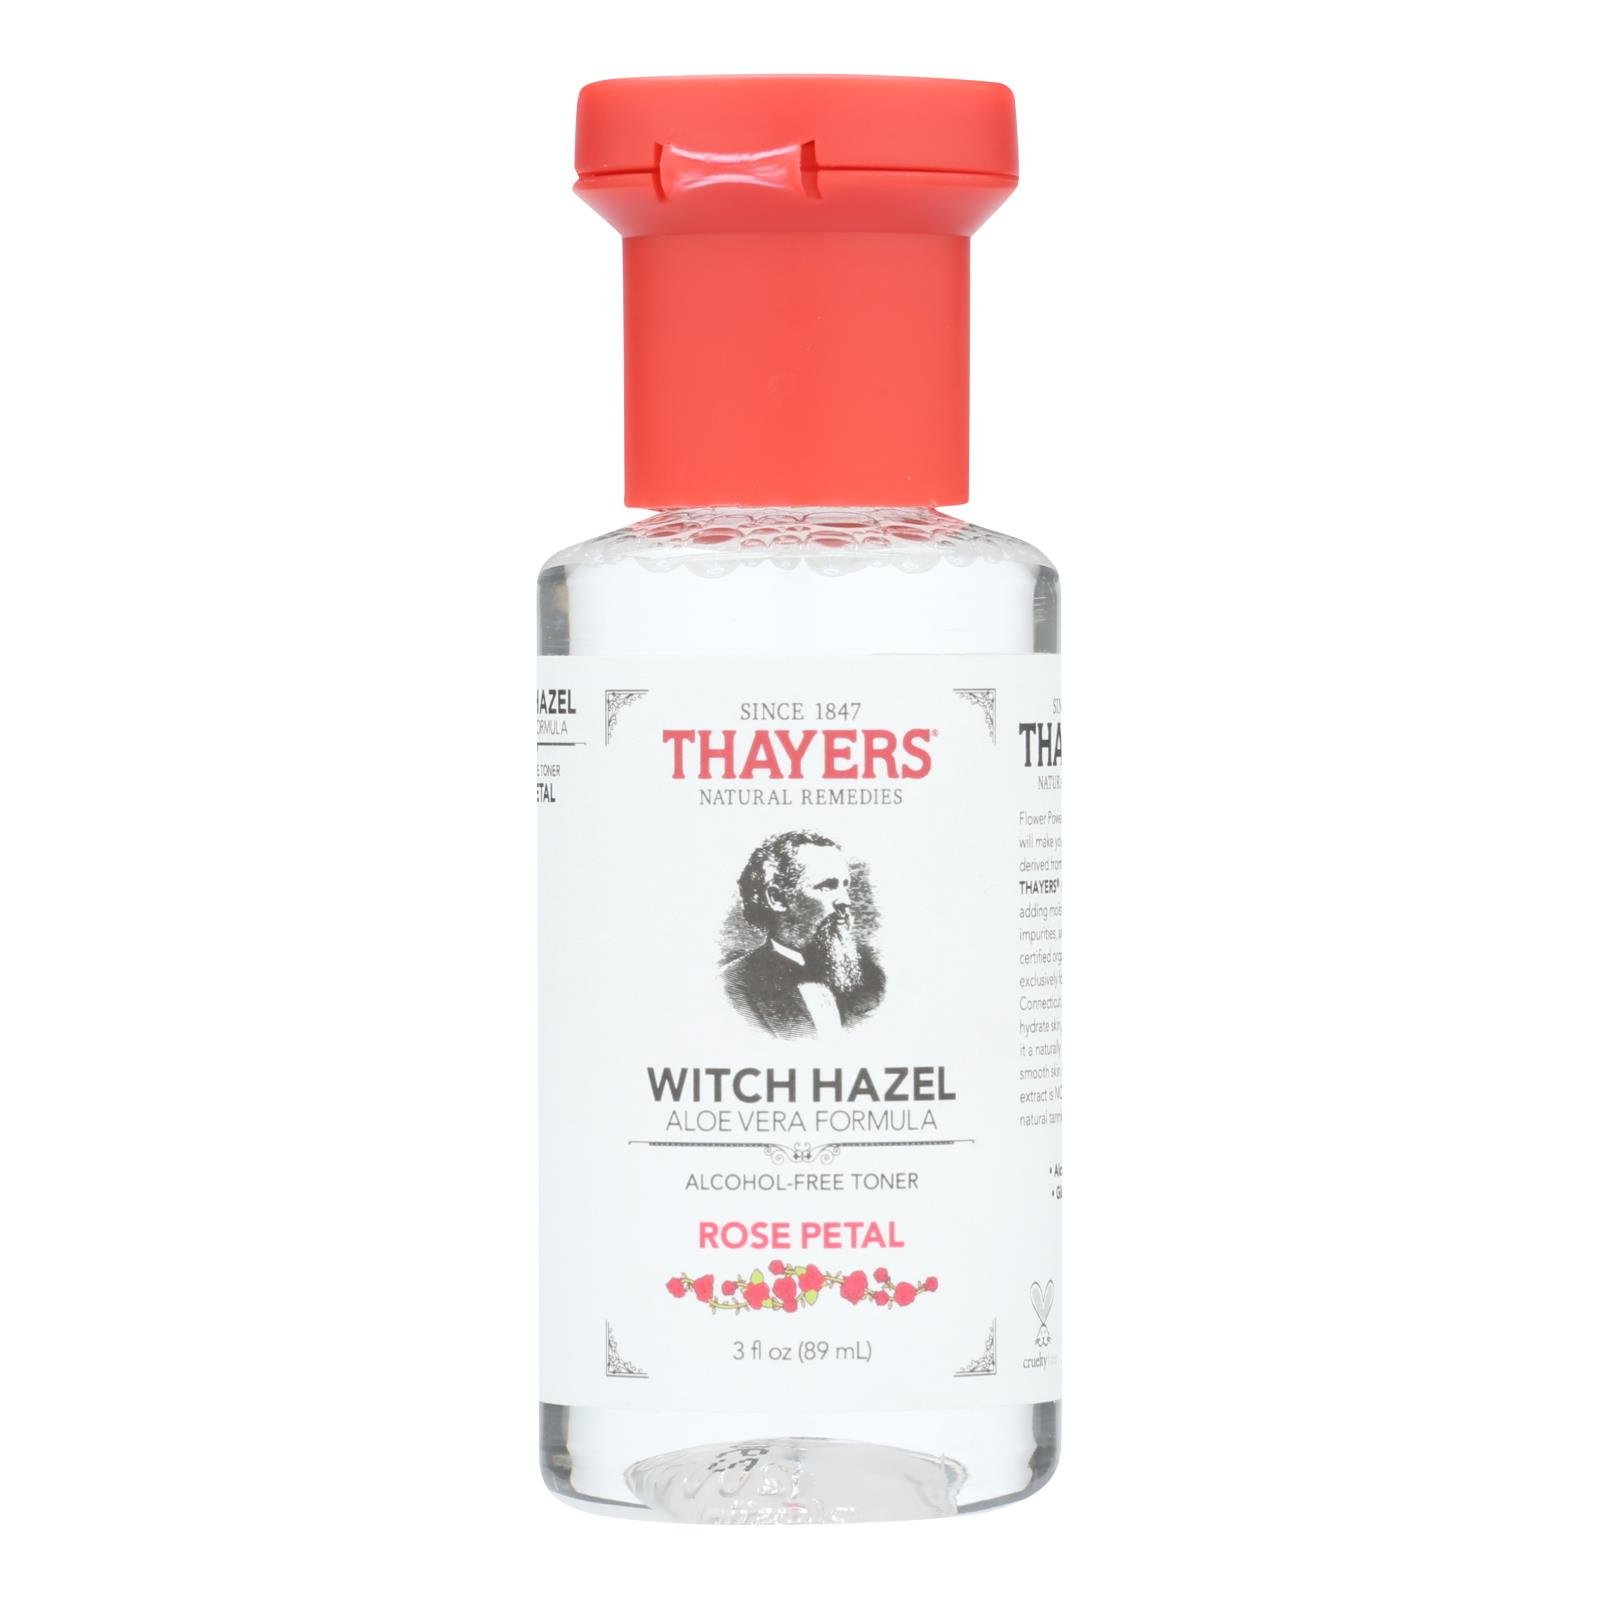 Thayers Witch Hazel - Rose Petal - Alcohol Free - Case of 24 - 3 fl oz